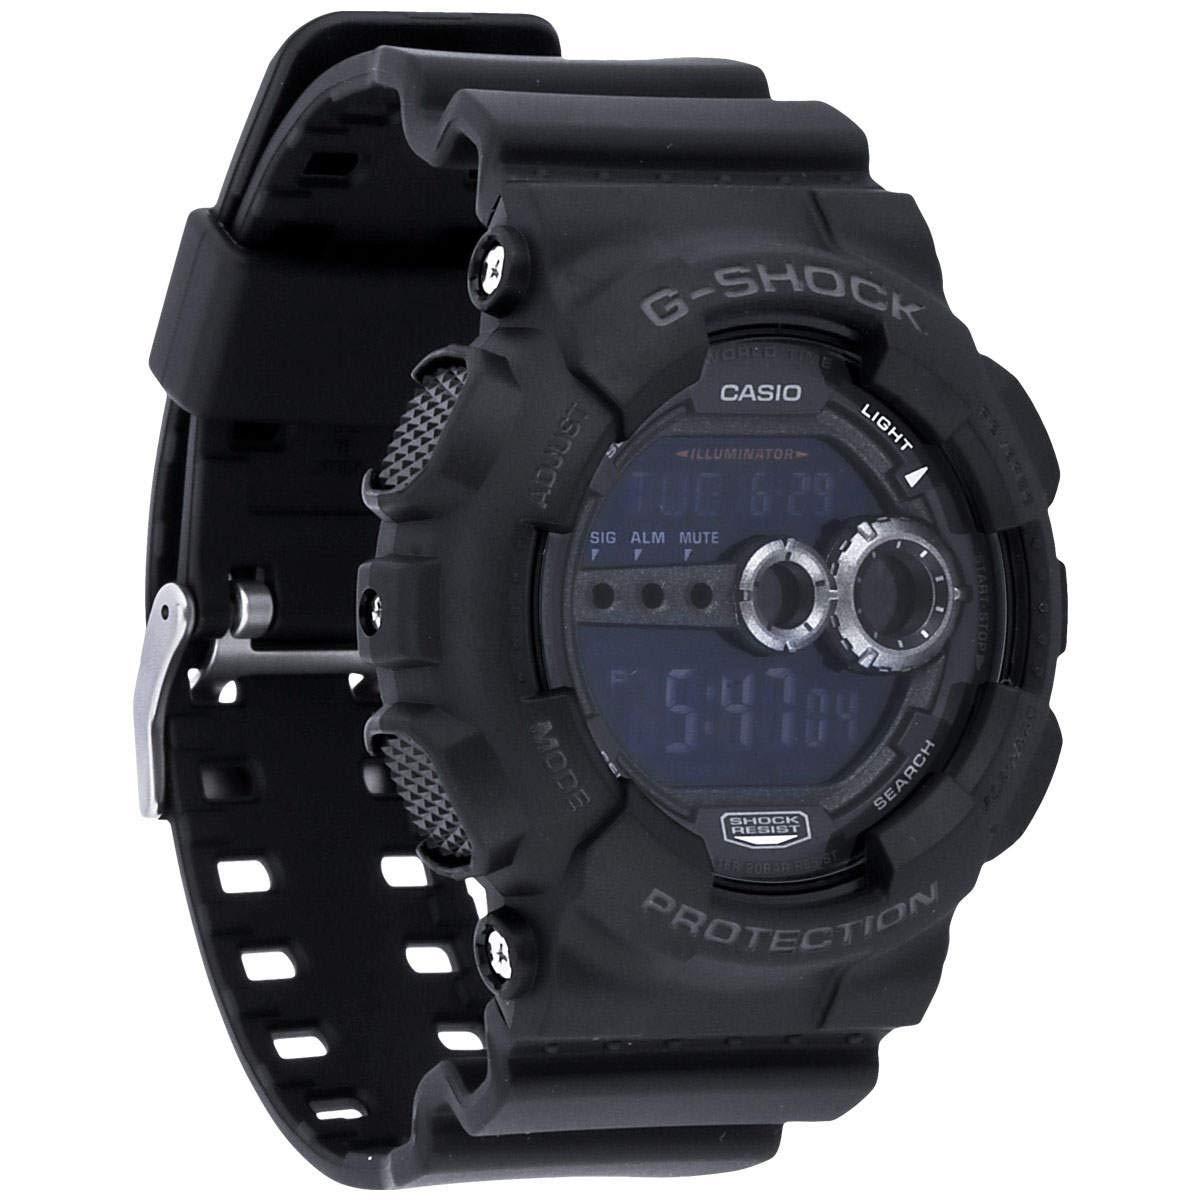 cc148084d65 Relógio Casio Unissex Preto G-Shock GD100-1BDR  Amazon.com.br  Amazon Moda